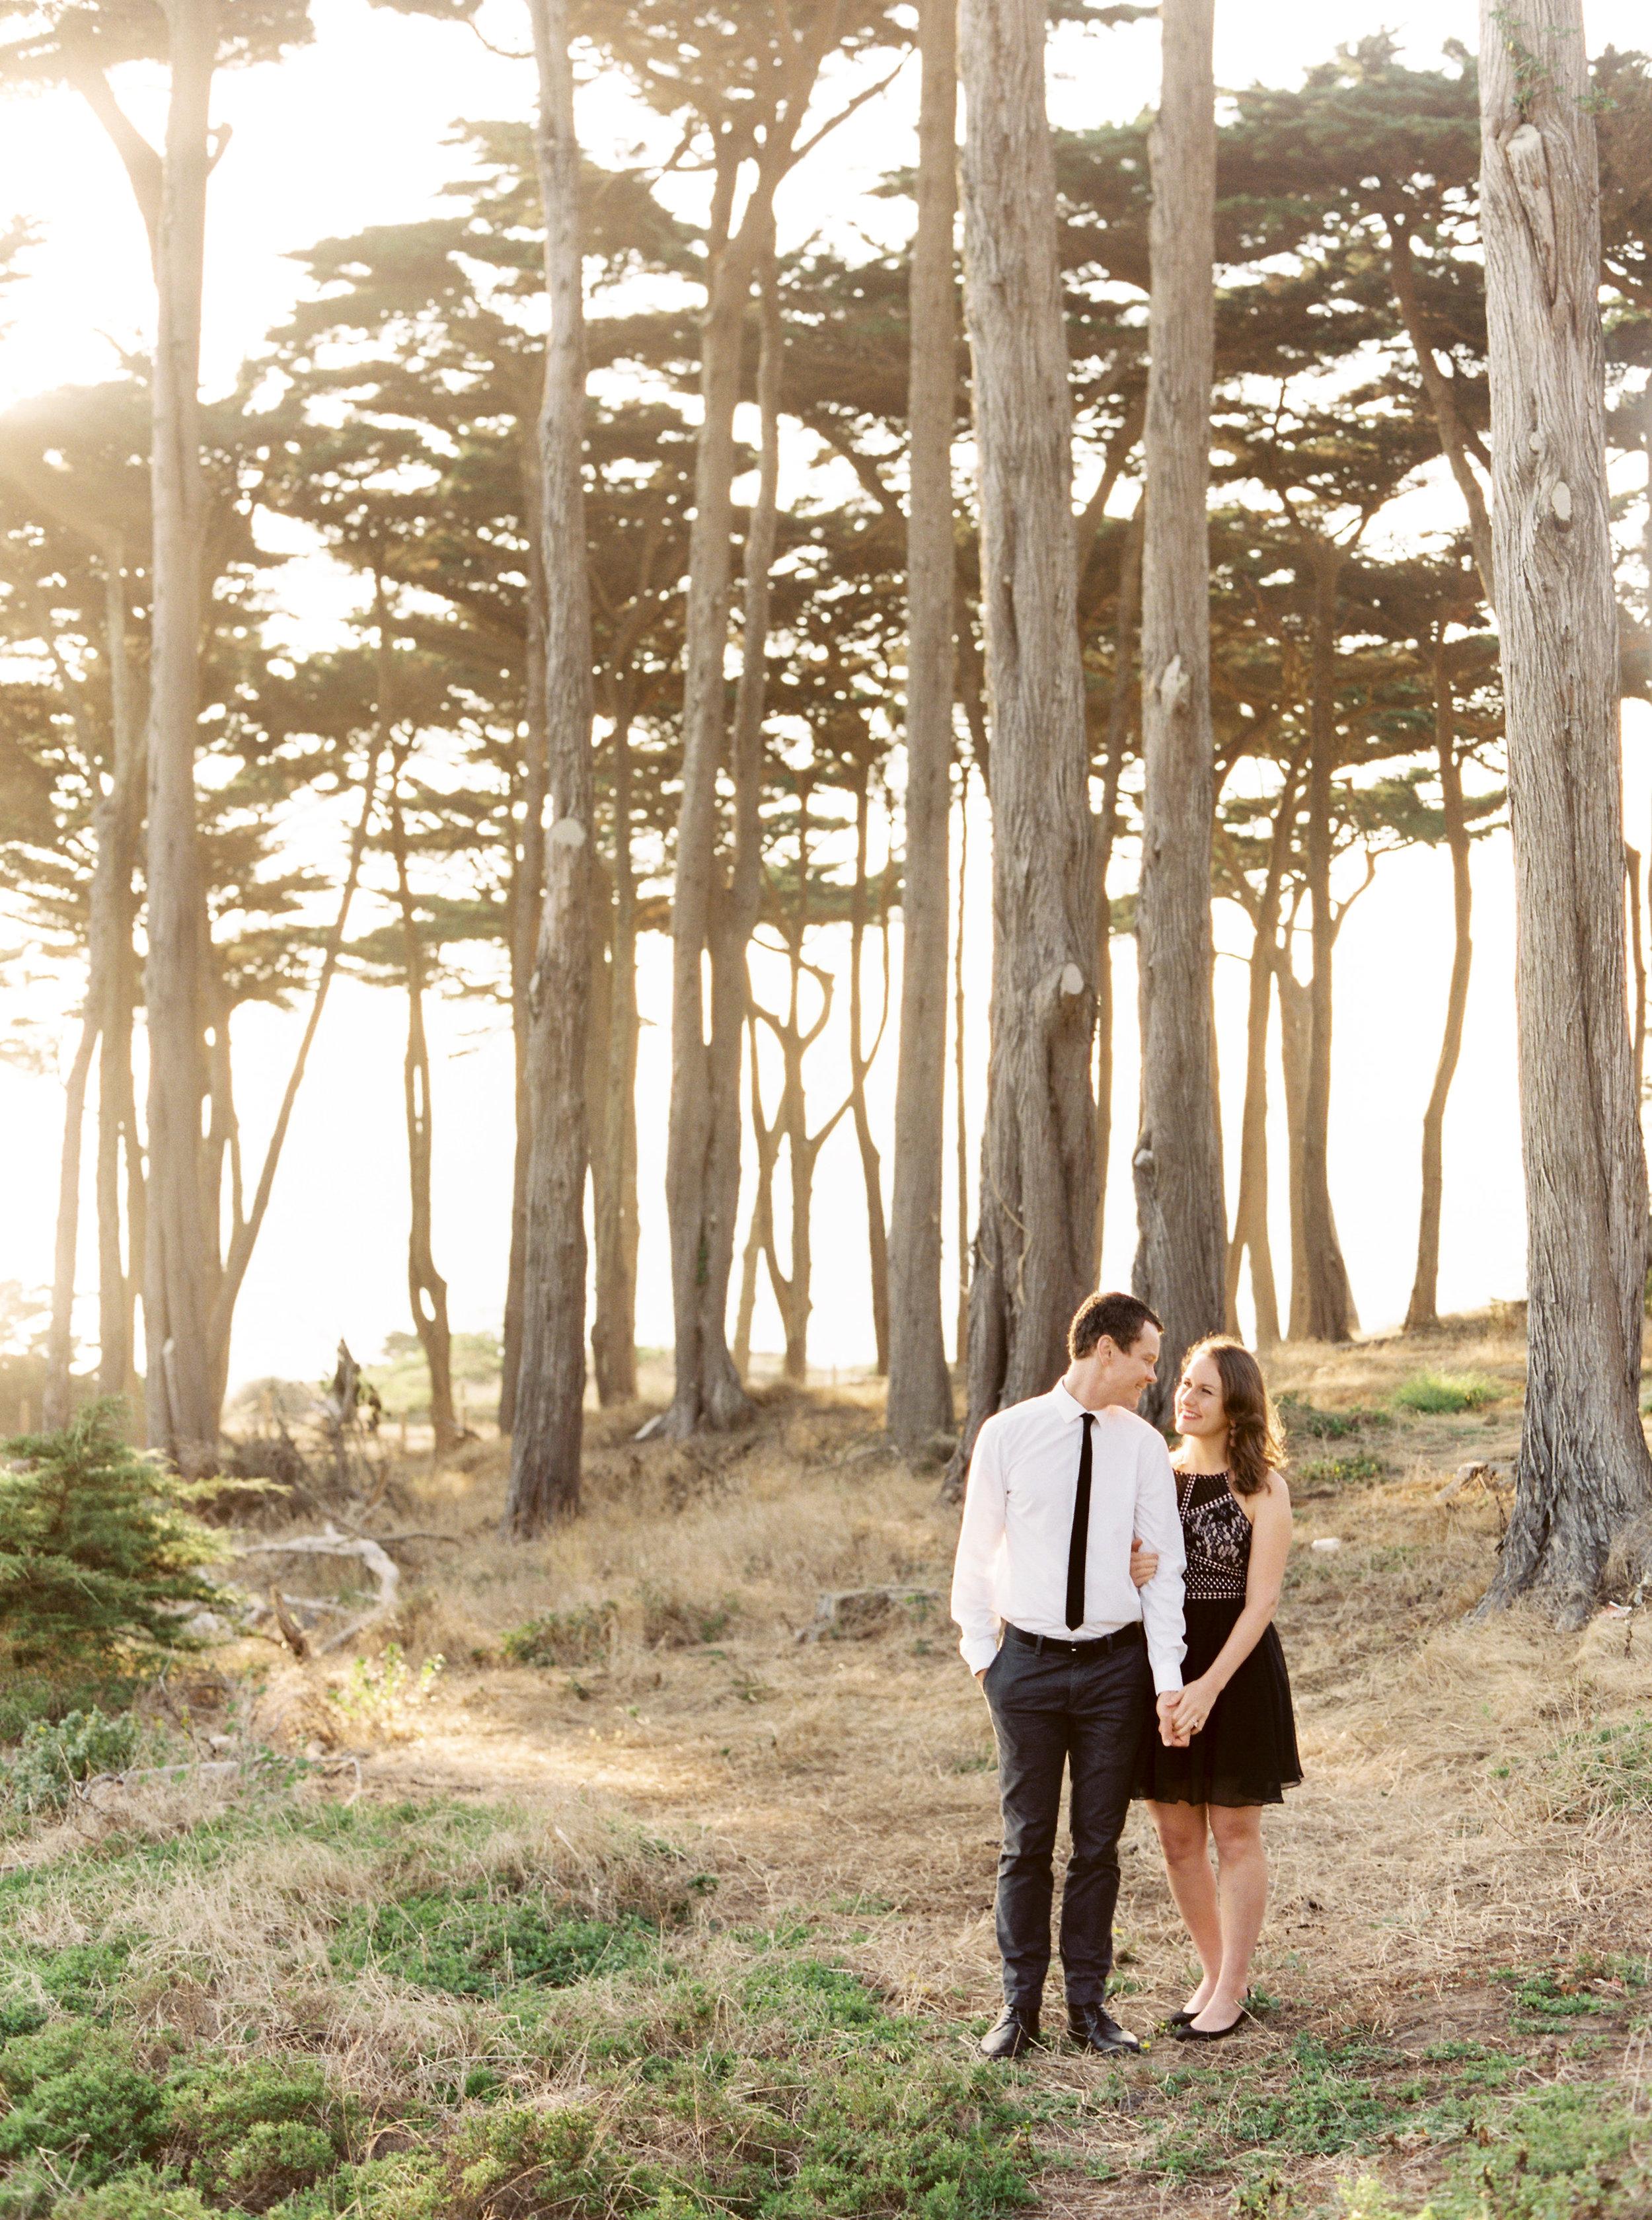 sutro-baths-san-francisco-california-engagement-3.jpg